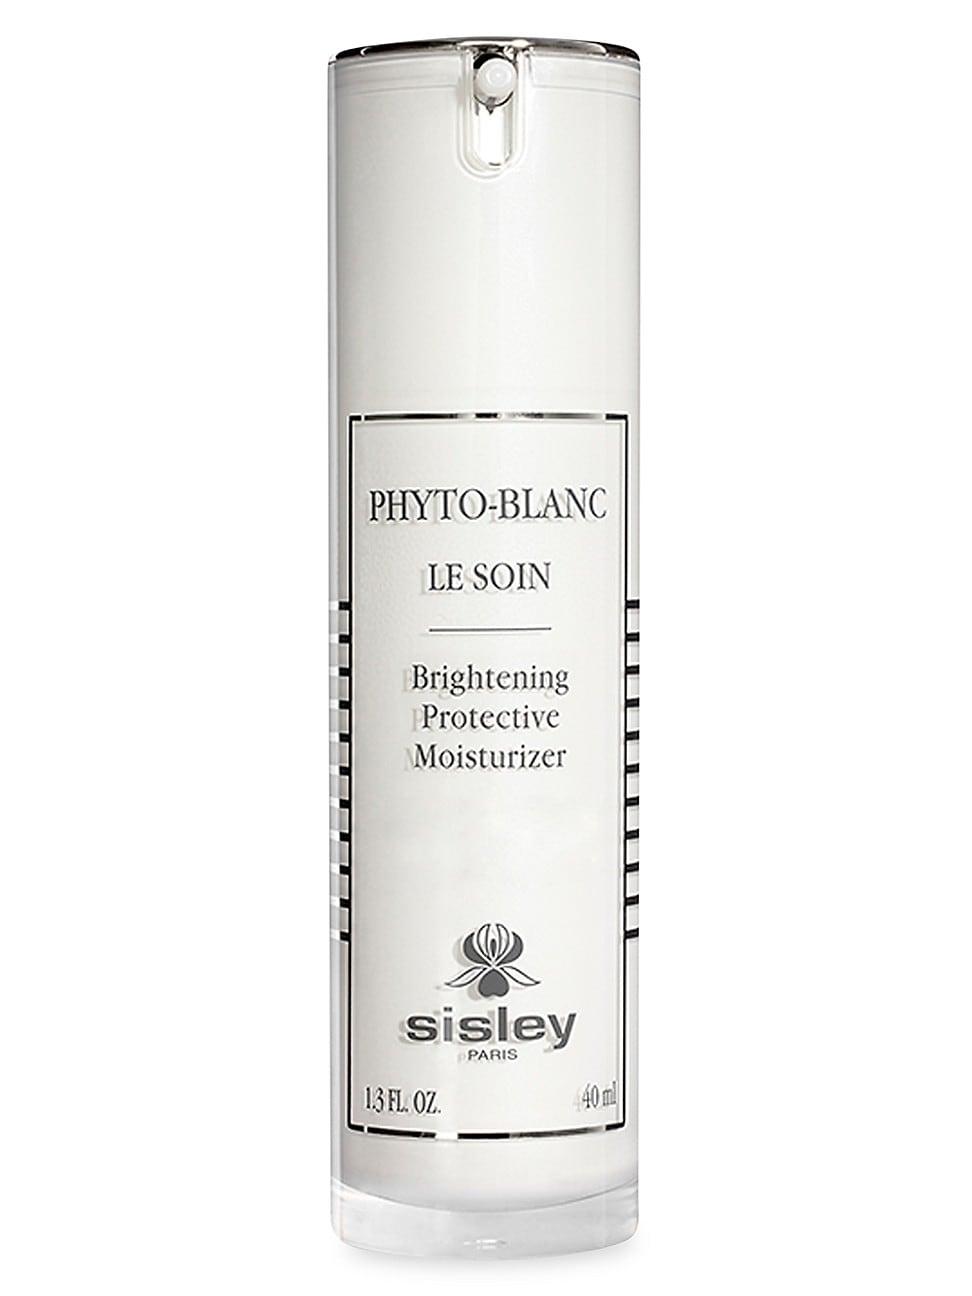 Sisley Paris Moisturizers PHYTO-BLANC LE SOIN BRIGHTENING PROTECTIVE MOISTURIZER